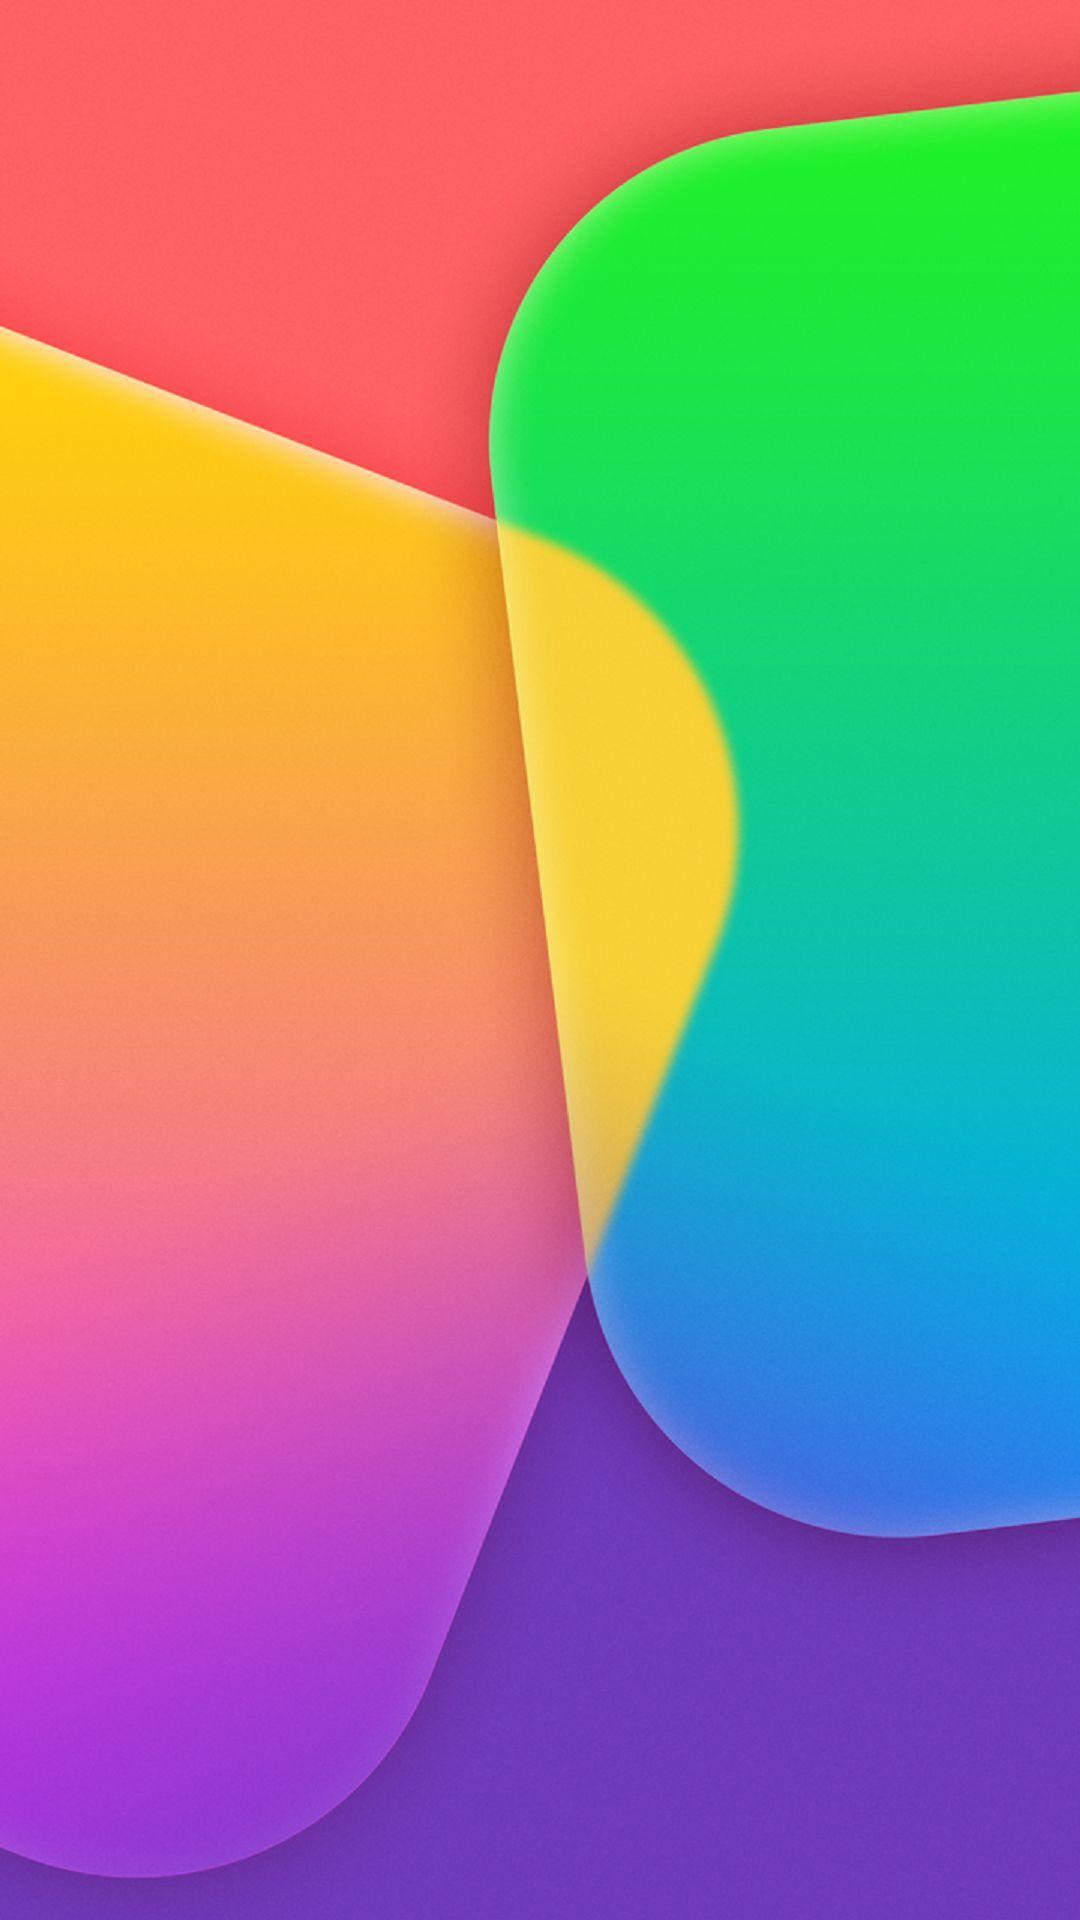 Wallpaper download app for iphone - Colorful App Tiles Iphone 6 Wallpaper